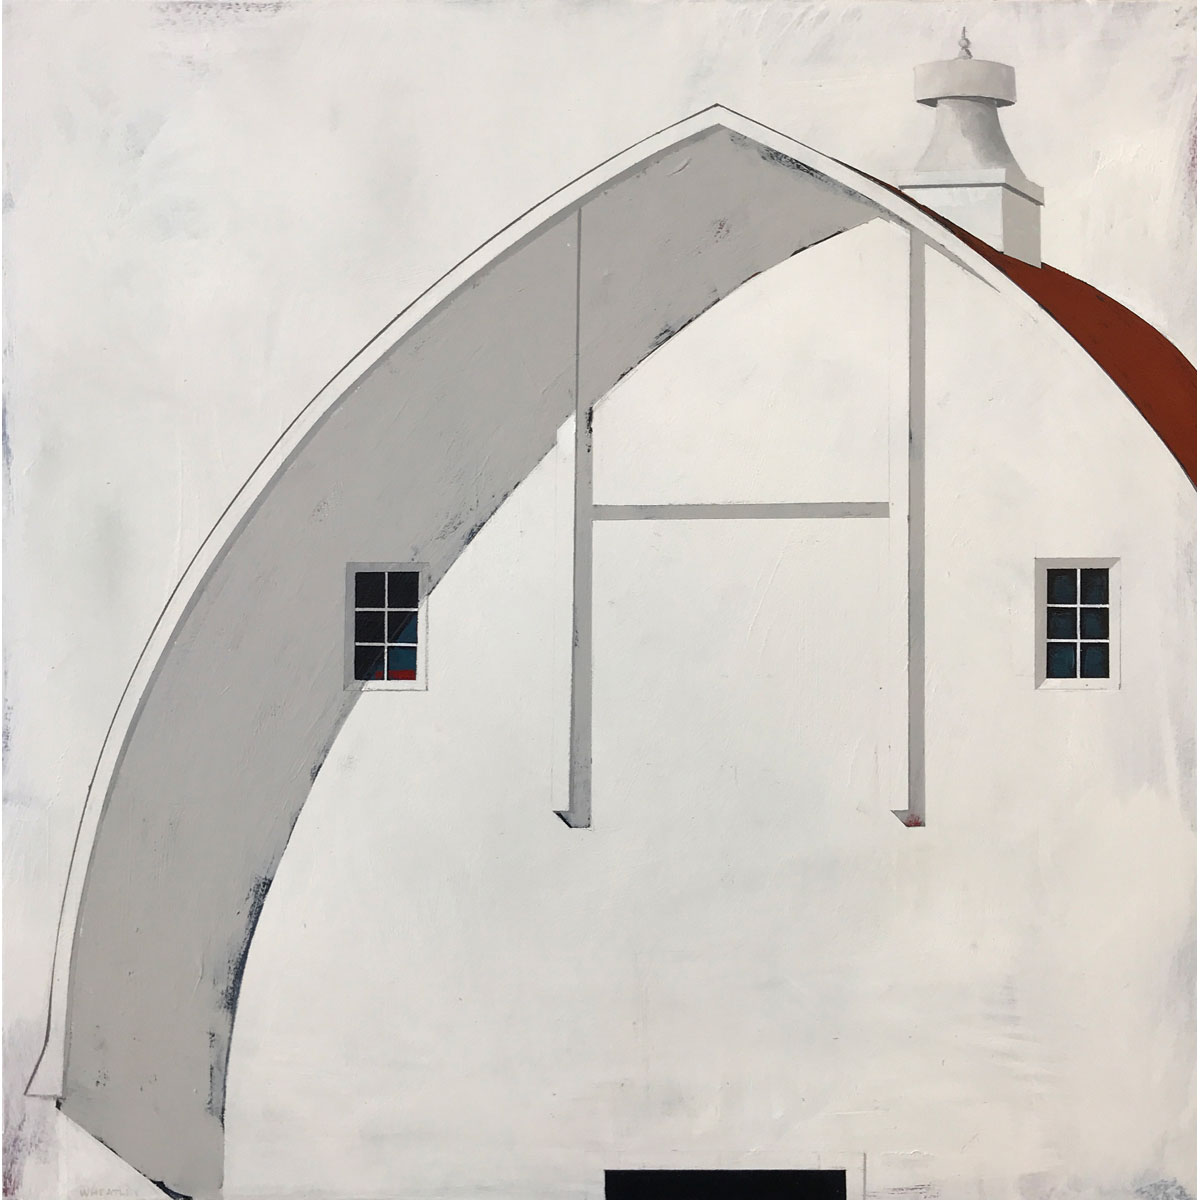 The Good Neighbor by Justin Wheatley